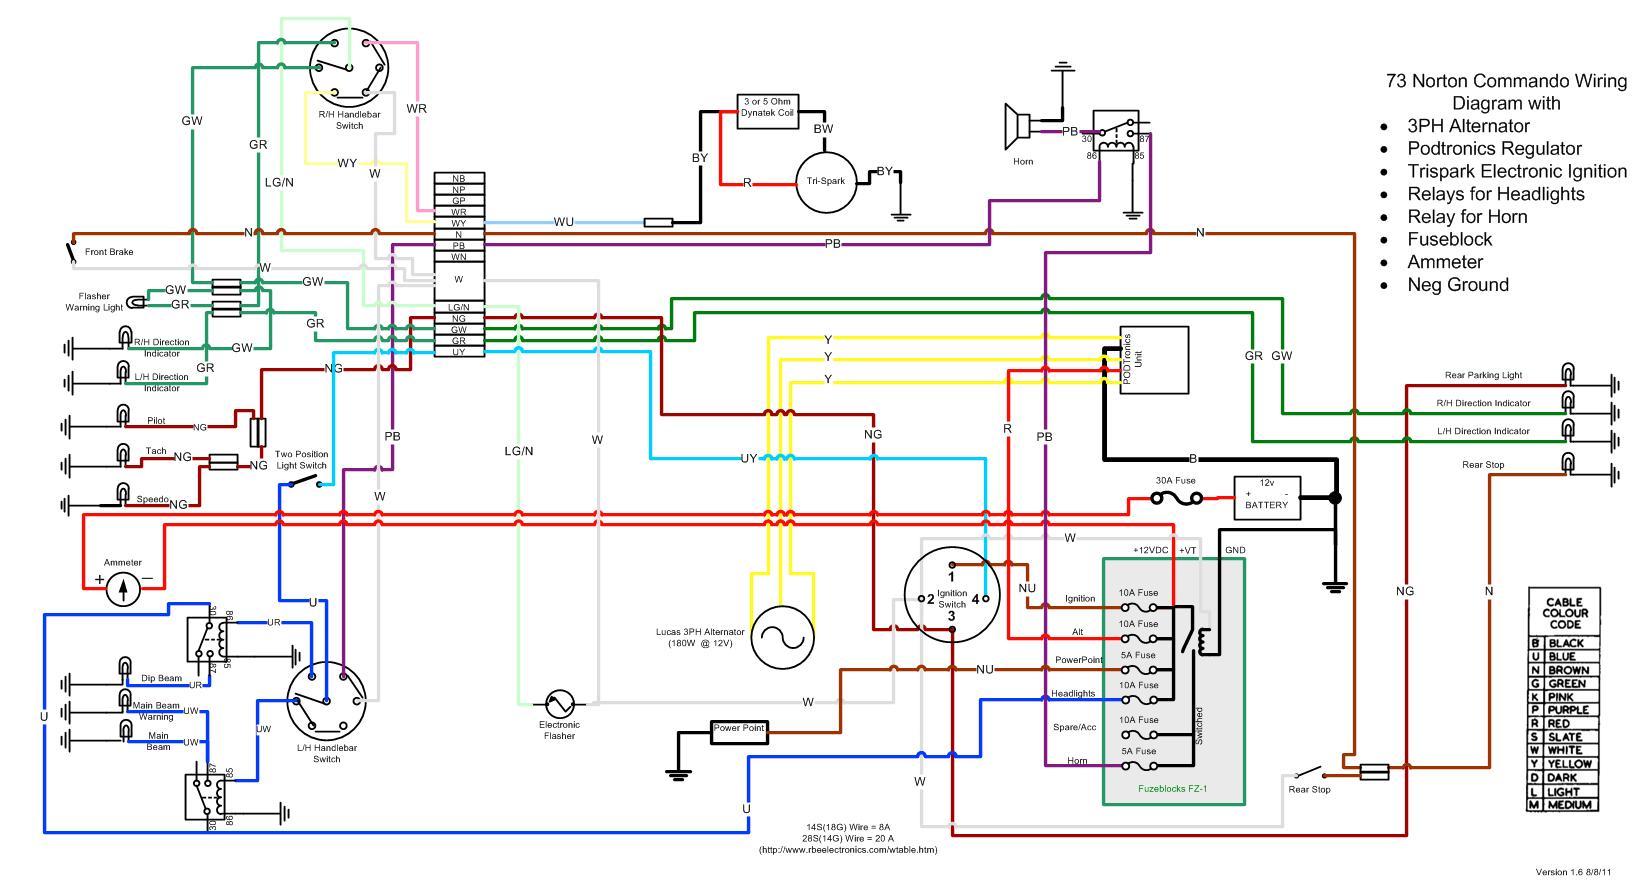 73wiringdiagram?resize\\\\\\\\\\\\\\\\\\\\\\\\\\\\\\\\\\\\\\\=665%2C359 wiring diagram for international dt4300,diagram \u2022 indy500 co  at virtualis.co